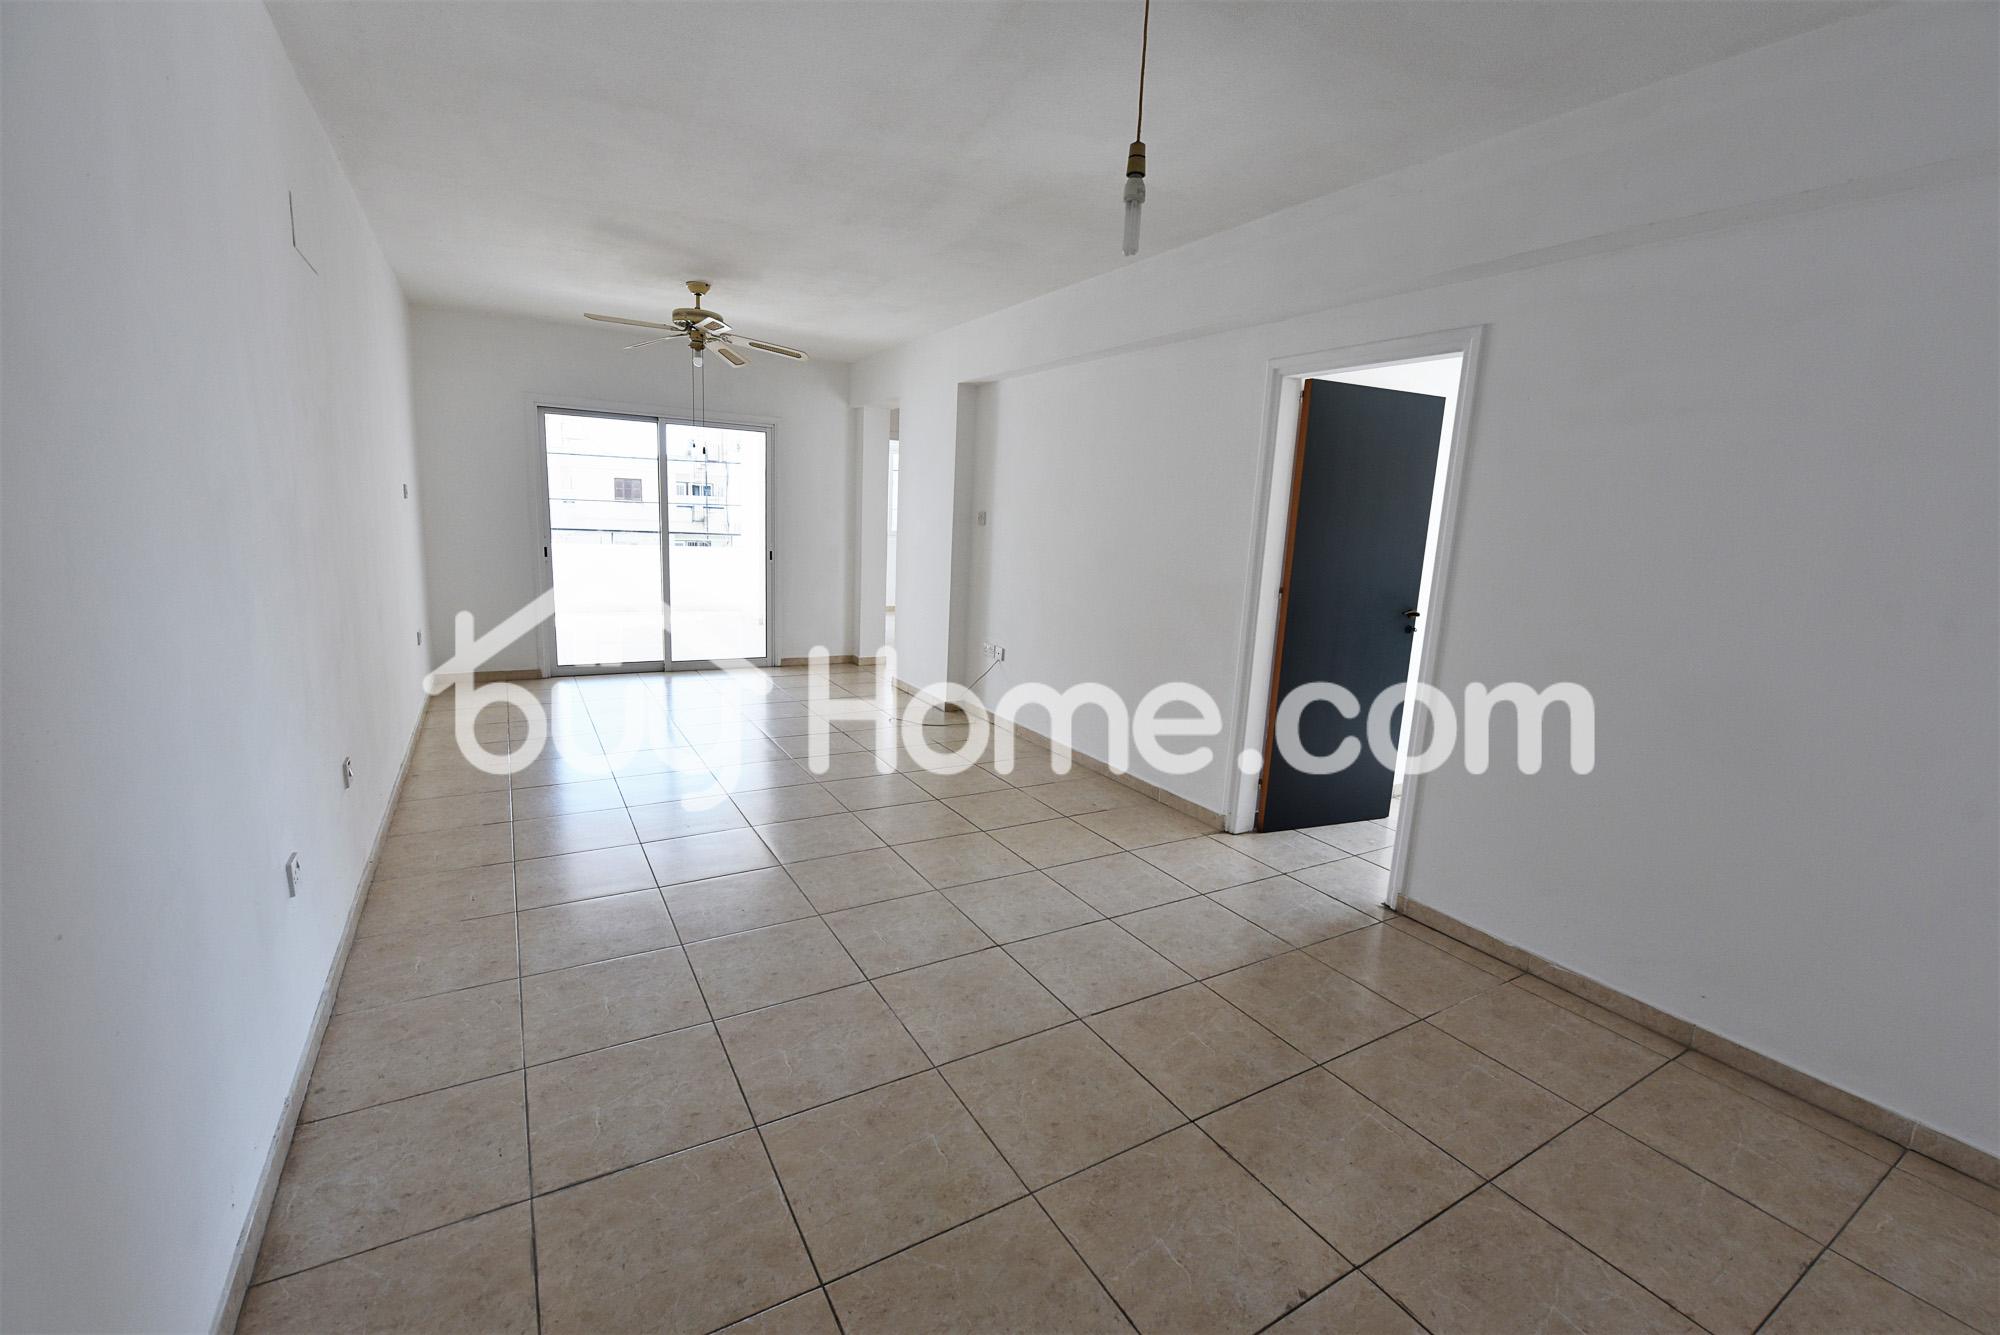 2 Bedroom Apartment Marina Area   BuyHome